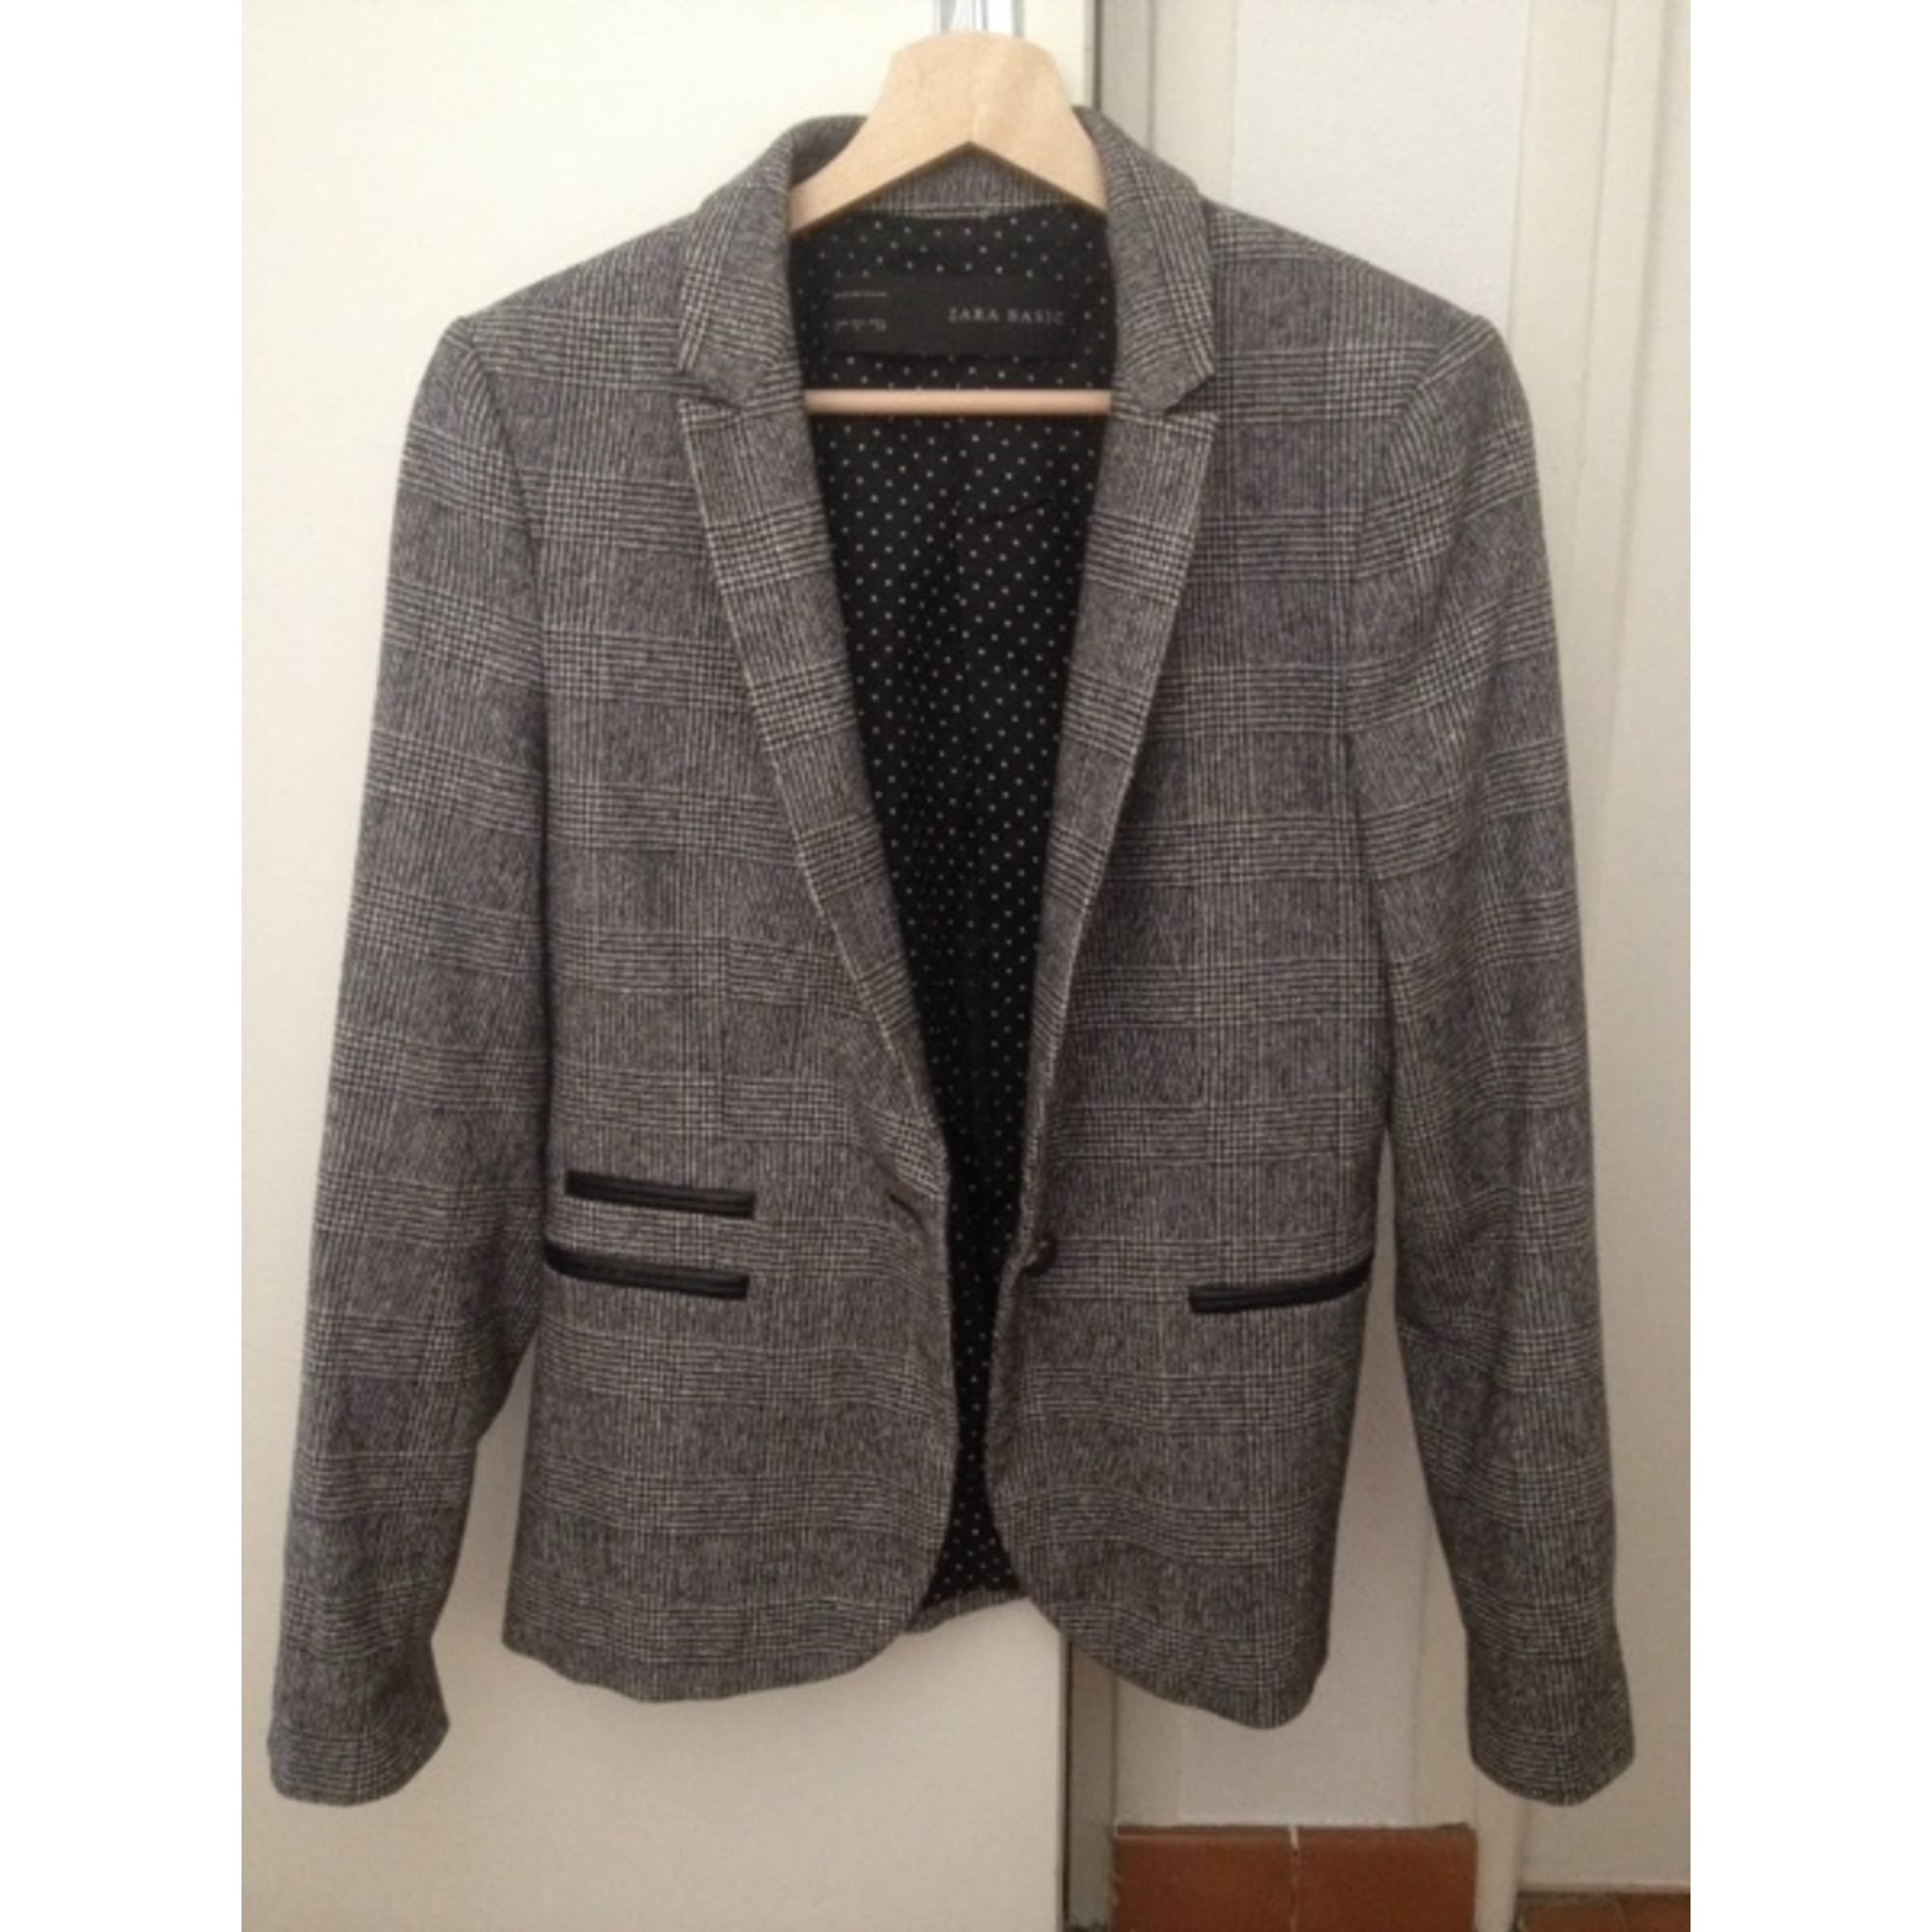 Blazer, veste tailleur ZARA 38 (M, T2) prince de galles noir